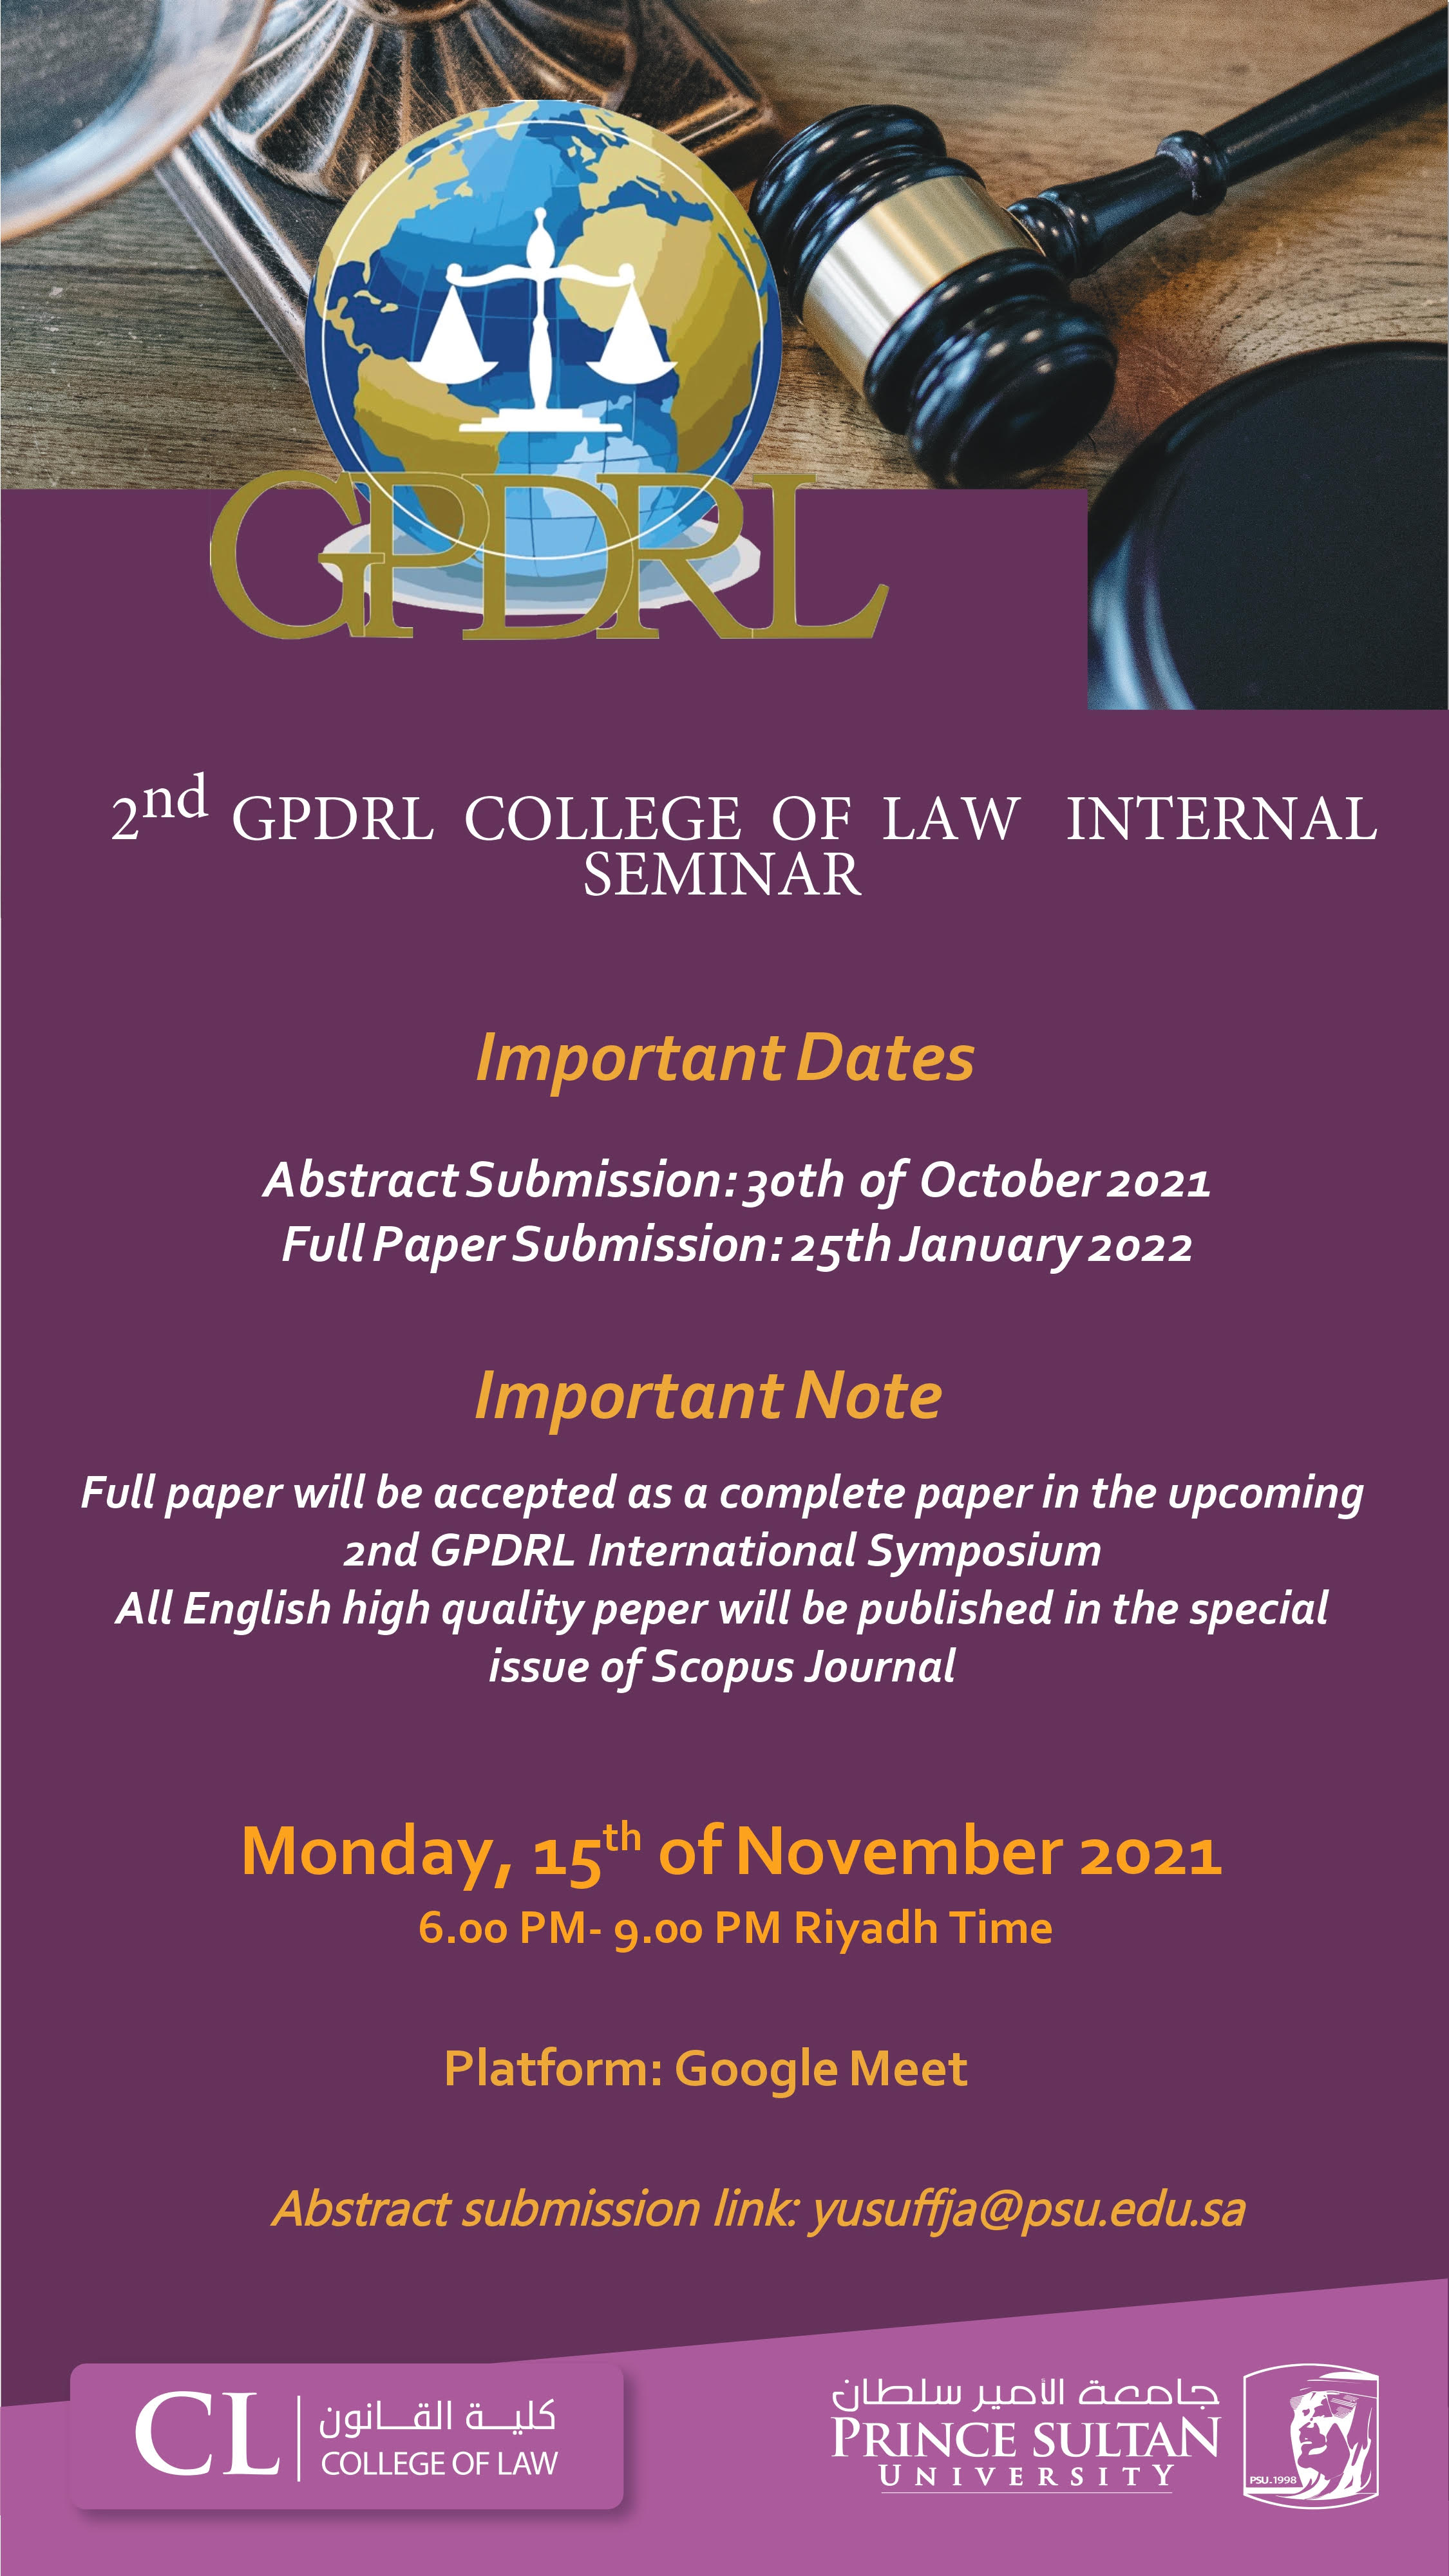 Second GPDRL College of Law Internal Seminar